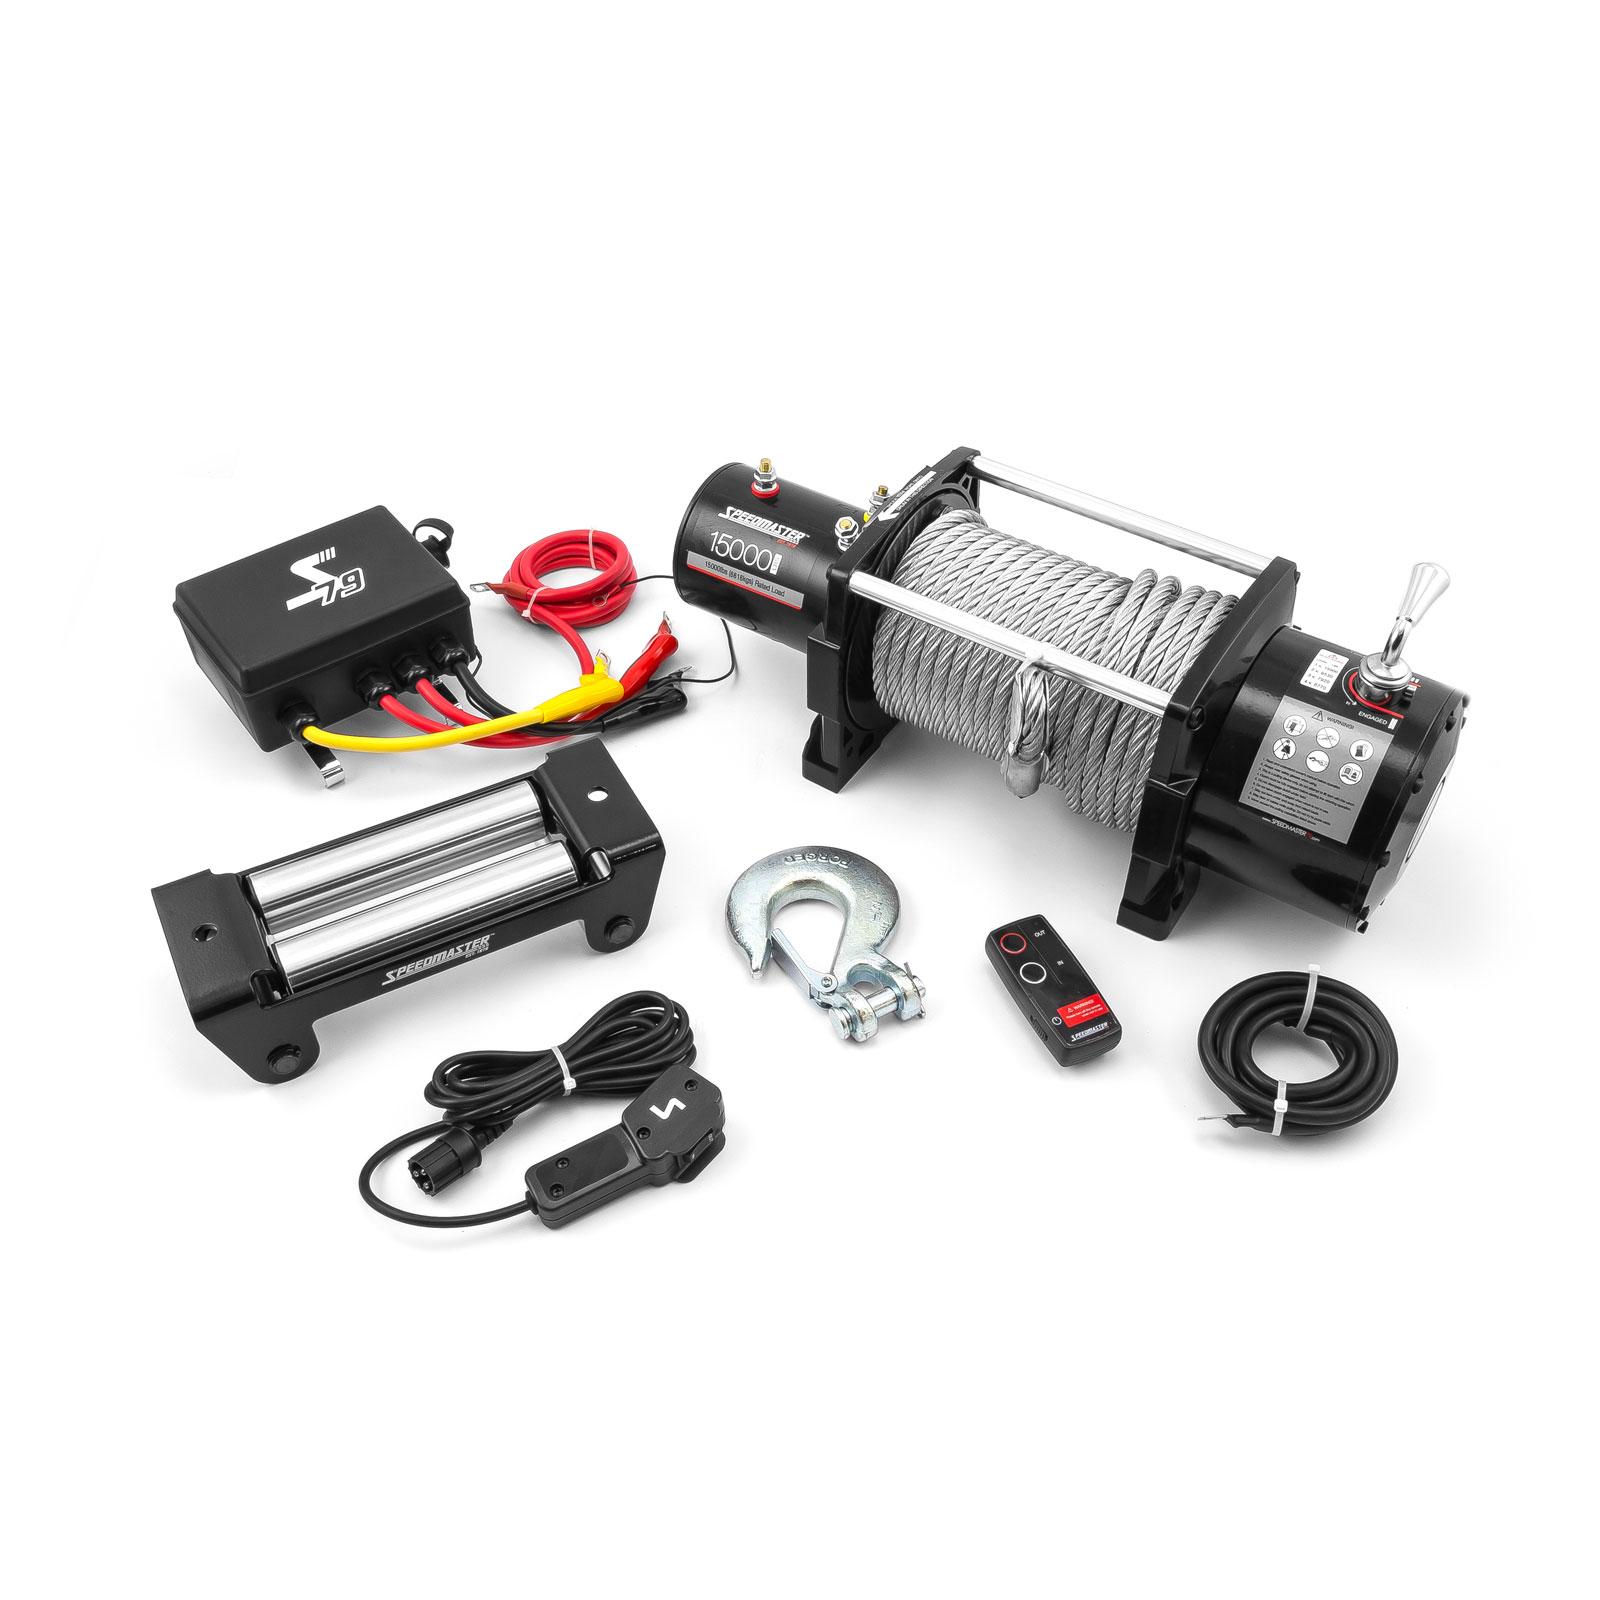 Speedmaster 15000lbs / 6803kgs 12V Electric 4wd Winch Kit w/ Wireless Remote